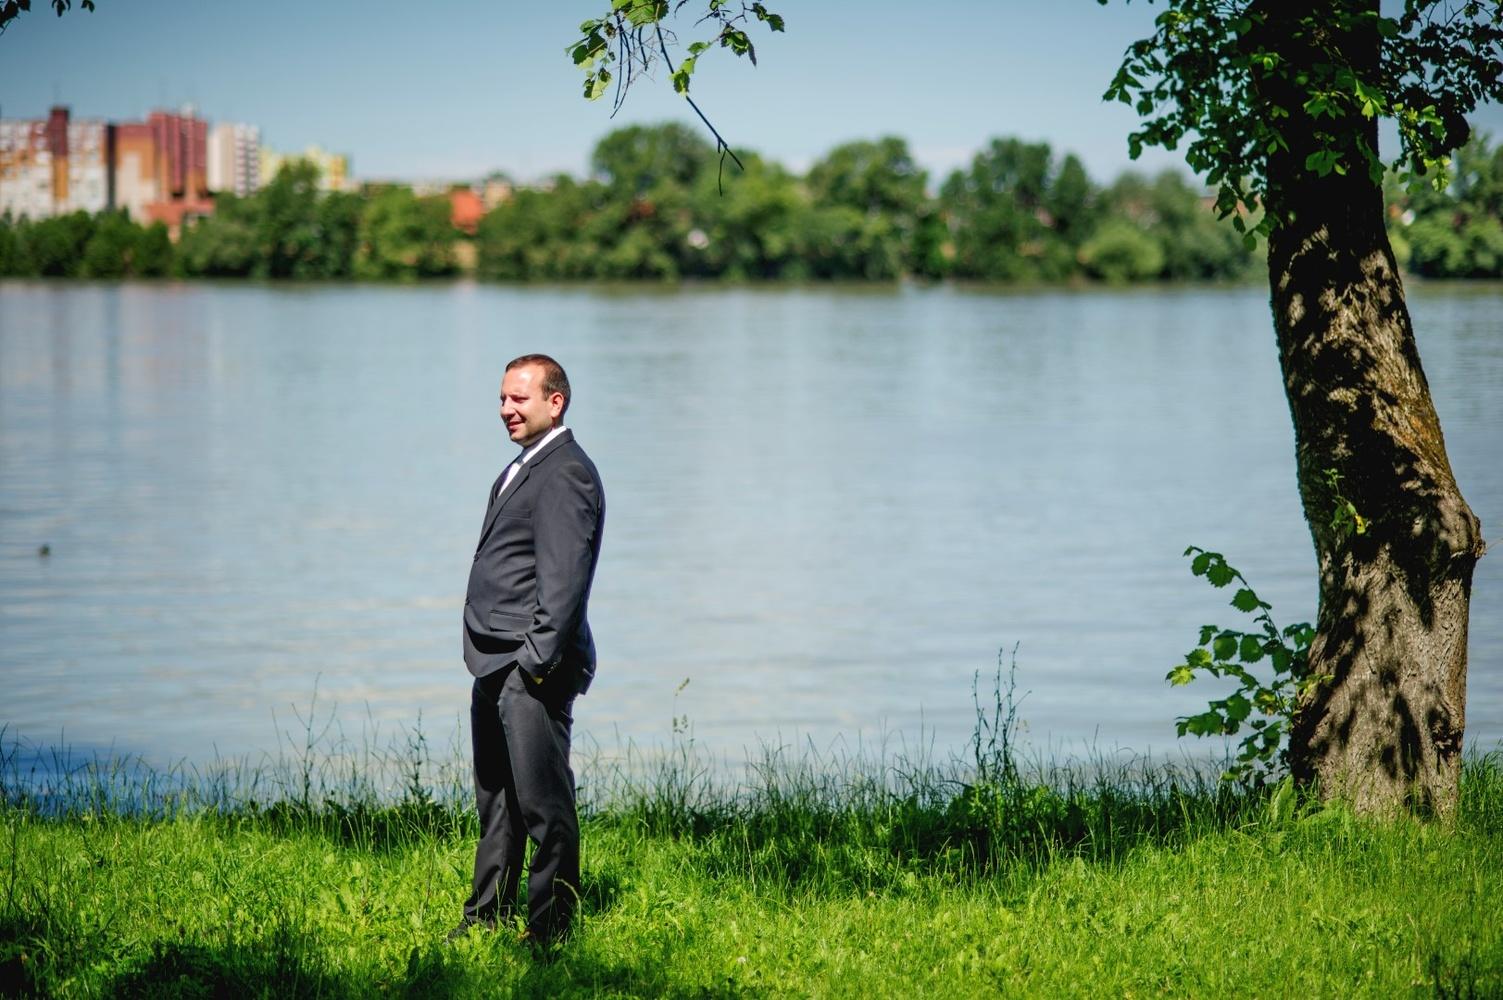 http://www.fotoz.sk/images/gallery-15/normal/eskuvo_horvath-kertvendeglo_101.jpg